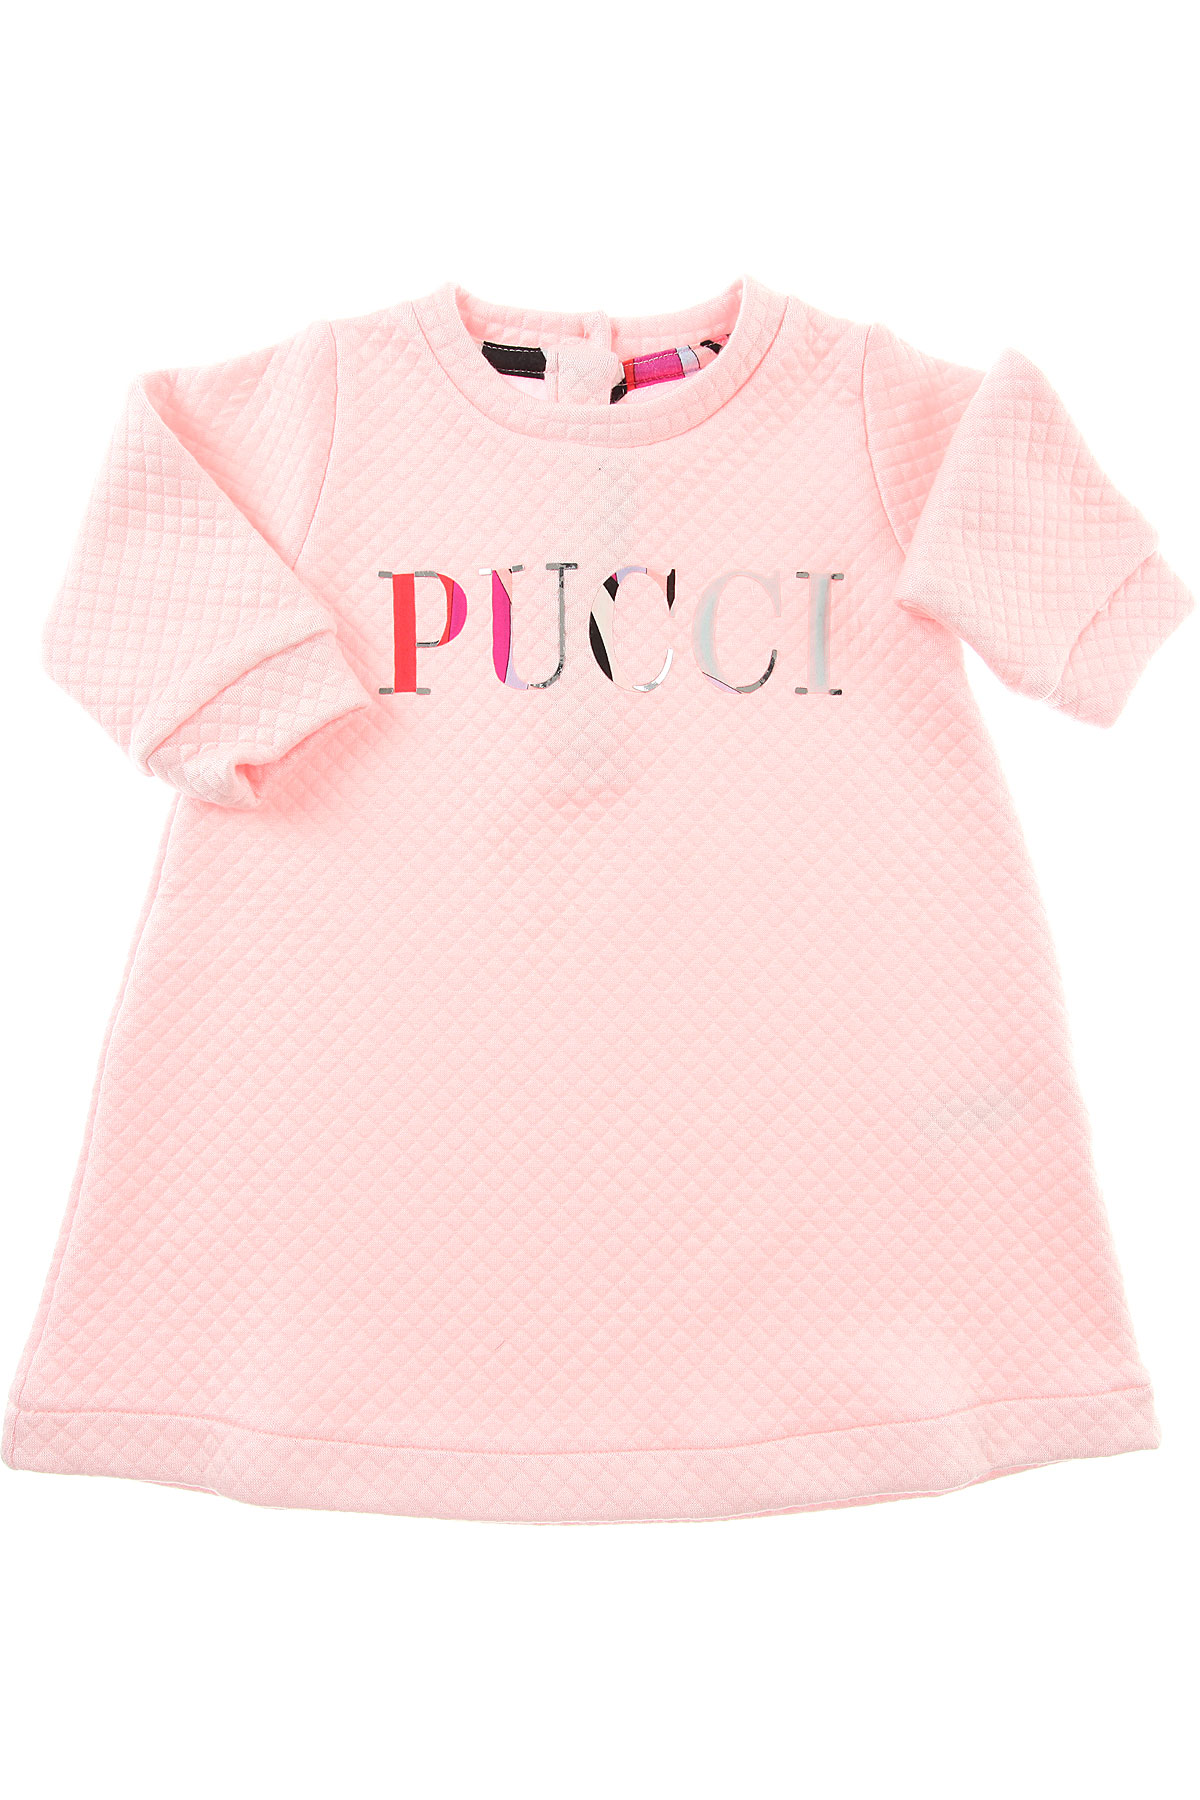 Image of Emilio Pucci Baby Dress for Girls, Pink, polyamide, 2017, 12M 18M 2Y 6M 9M